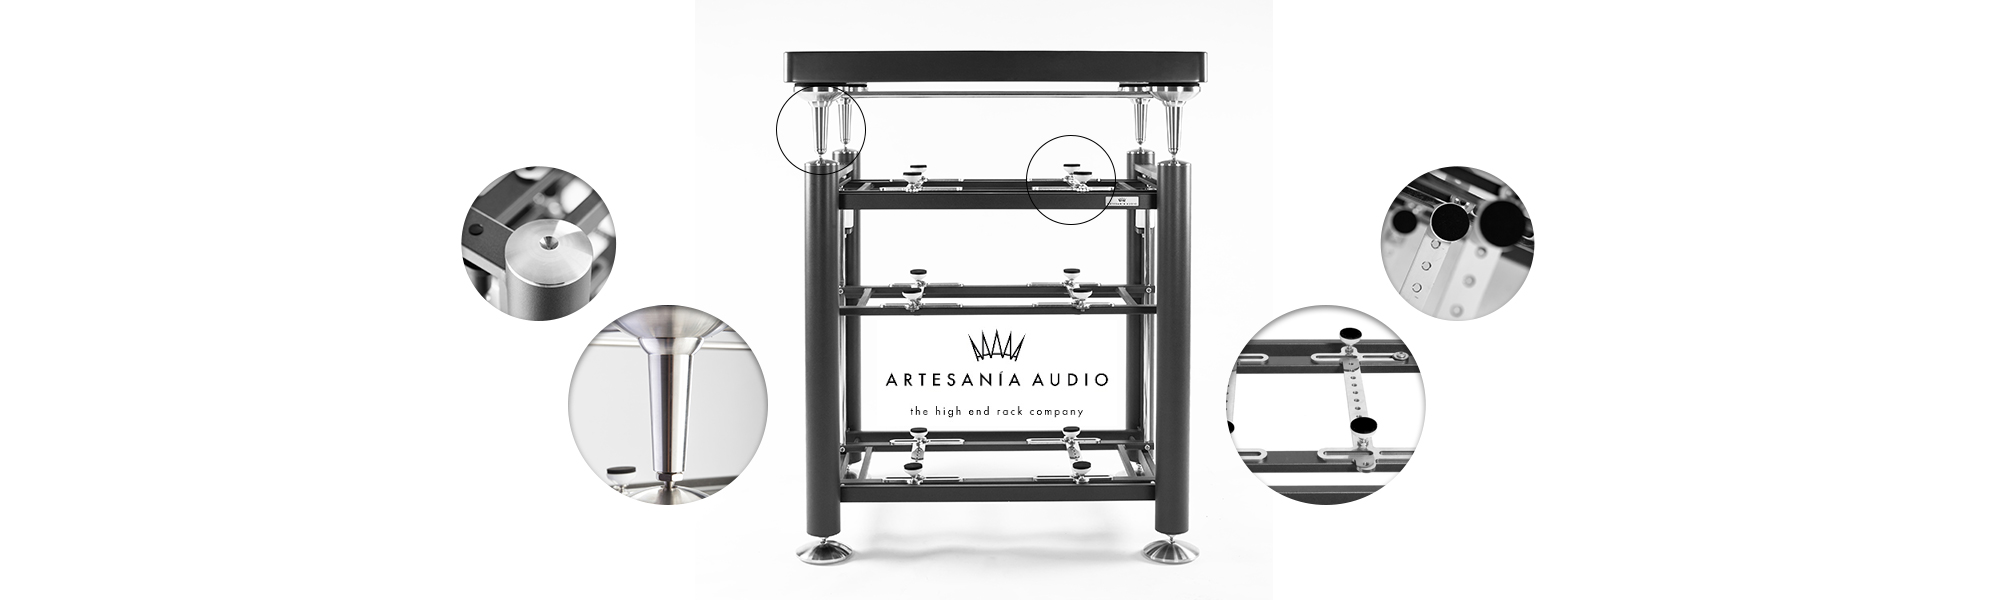 Artesania Exoteryc equipment rack